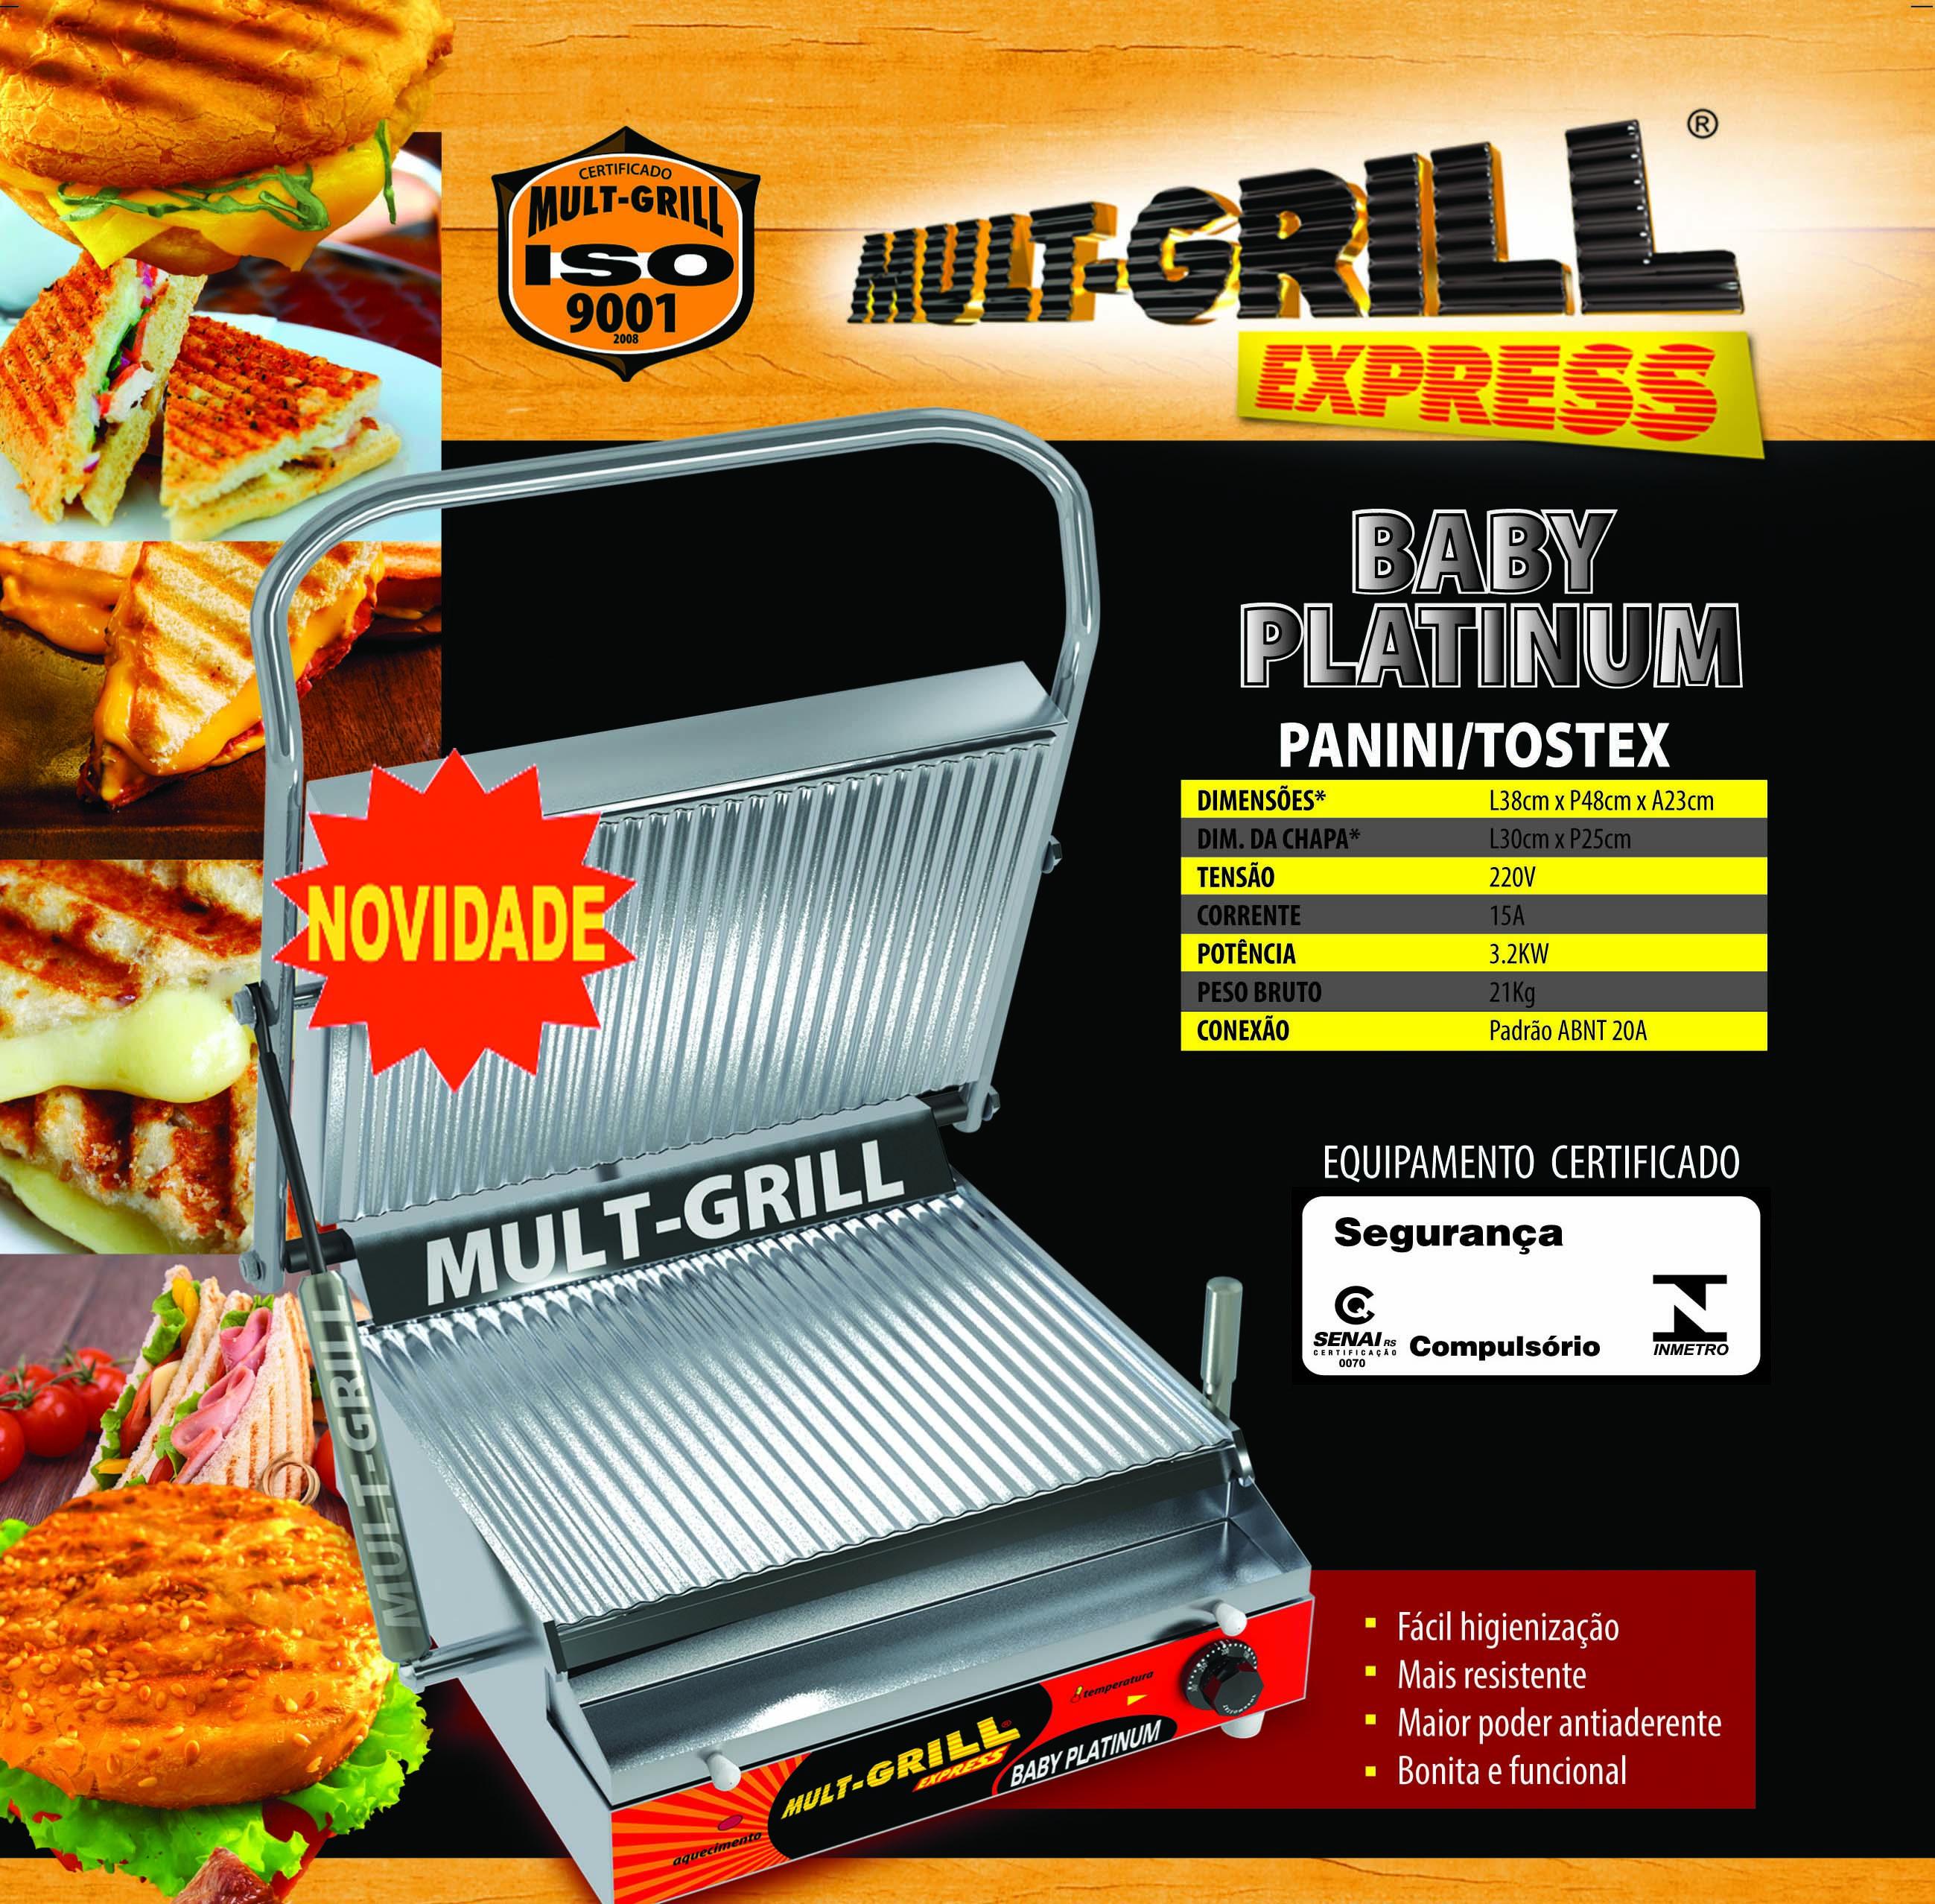 Lançamento Baby Platinum Panini-Tostex Mult-Grill